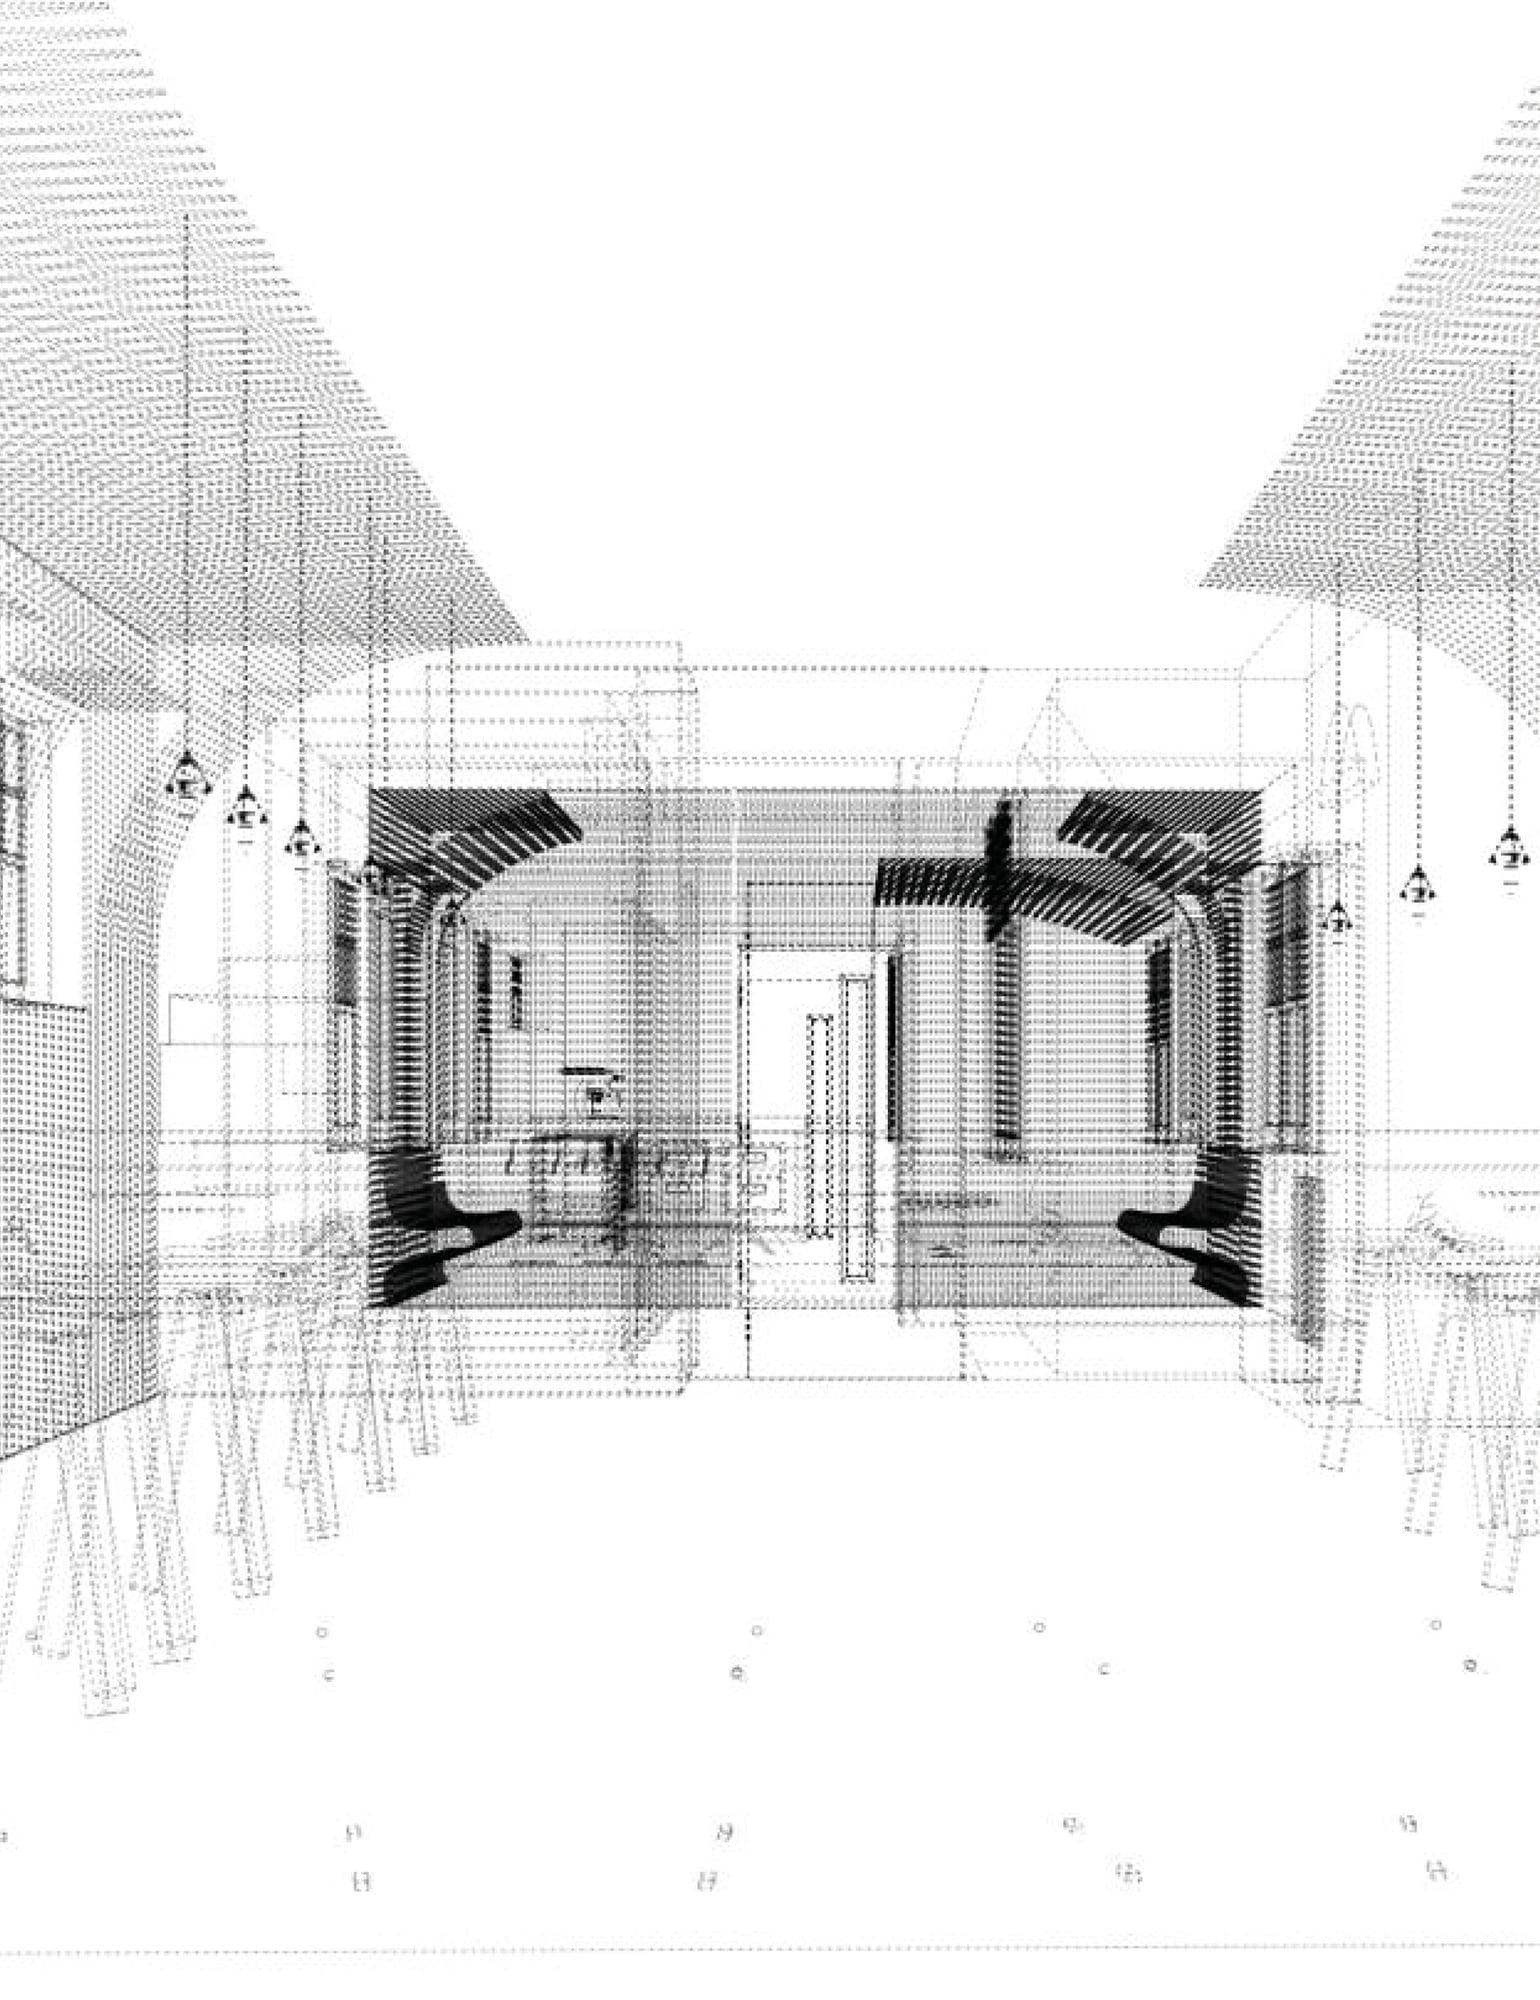 Interior Architecture And Design BA Hons